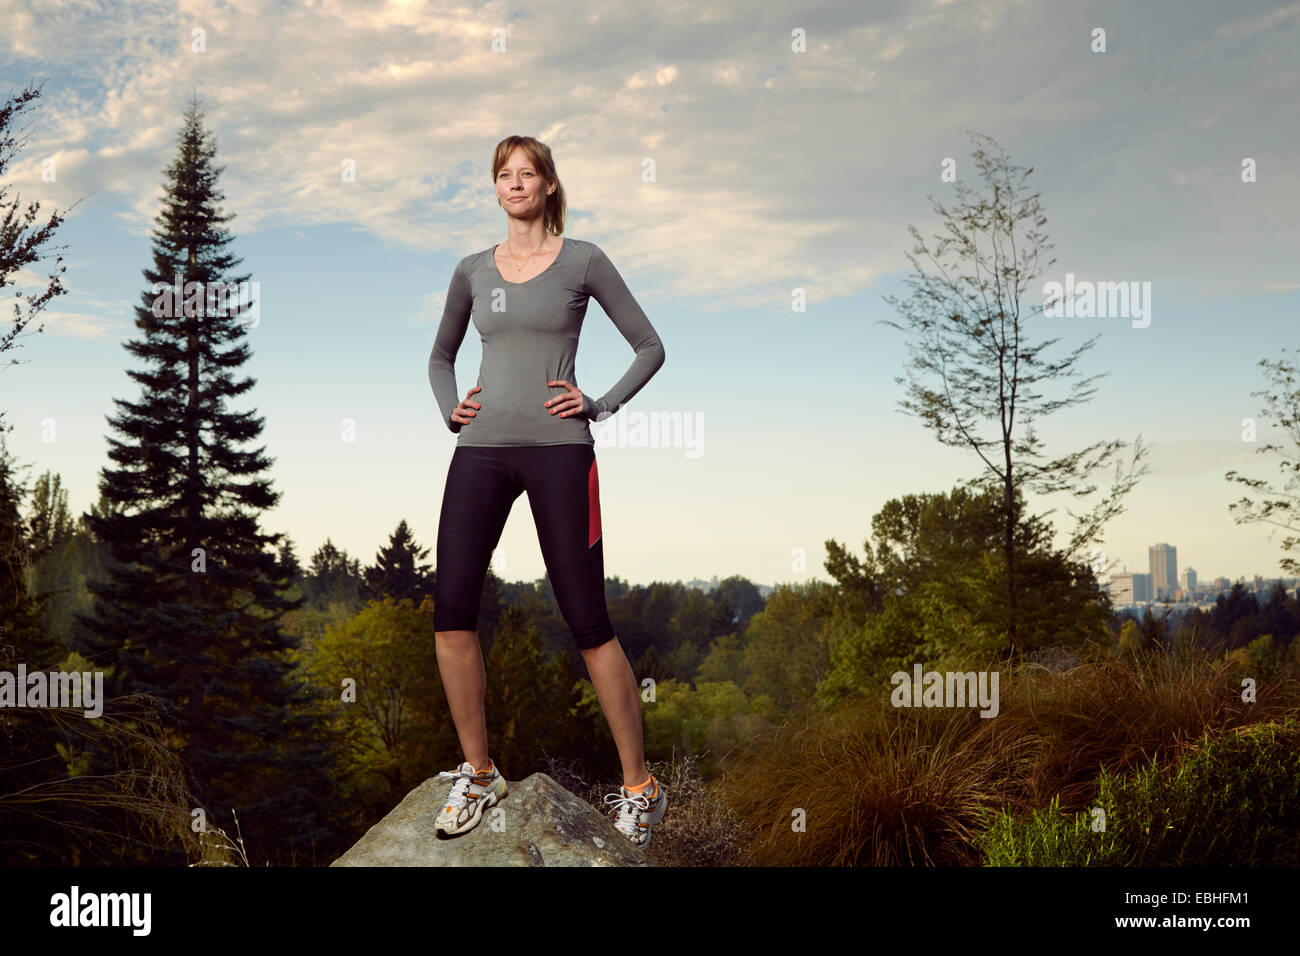 Portrait of female runner on top of boulder in park - Stock Image